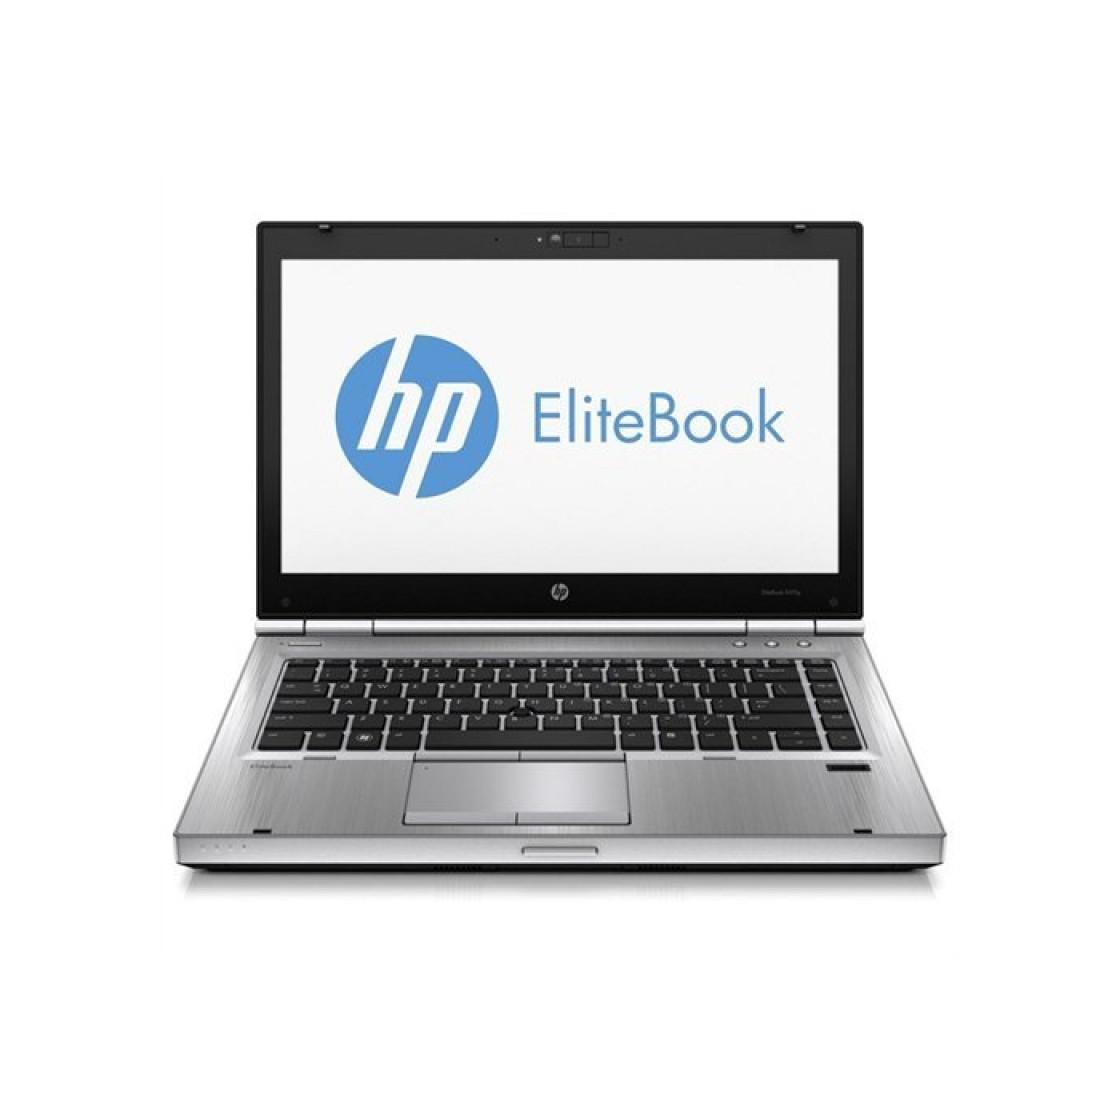 HP EliteBook 8470P 14-inch (2012) - Core i5-3210M - 4GB - HDD 1 TB AZERTY - French